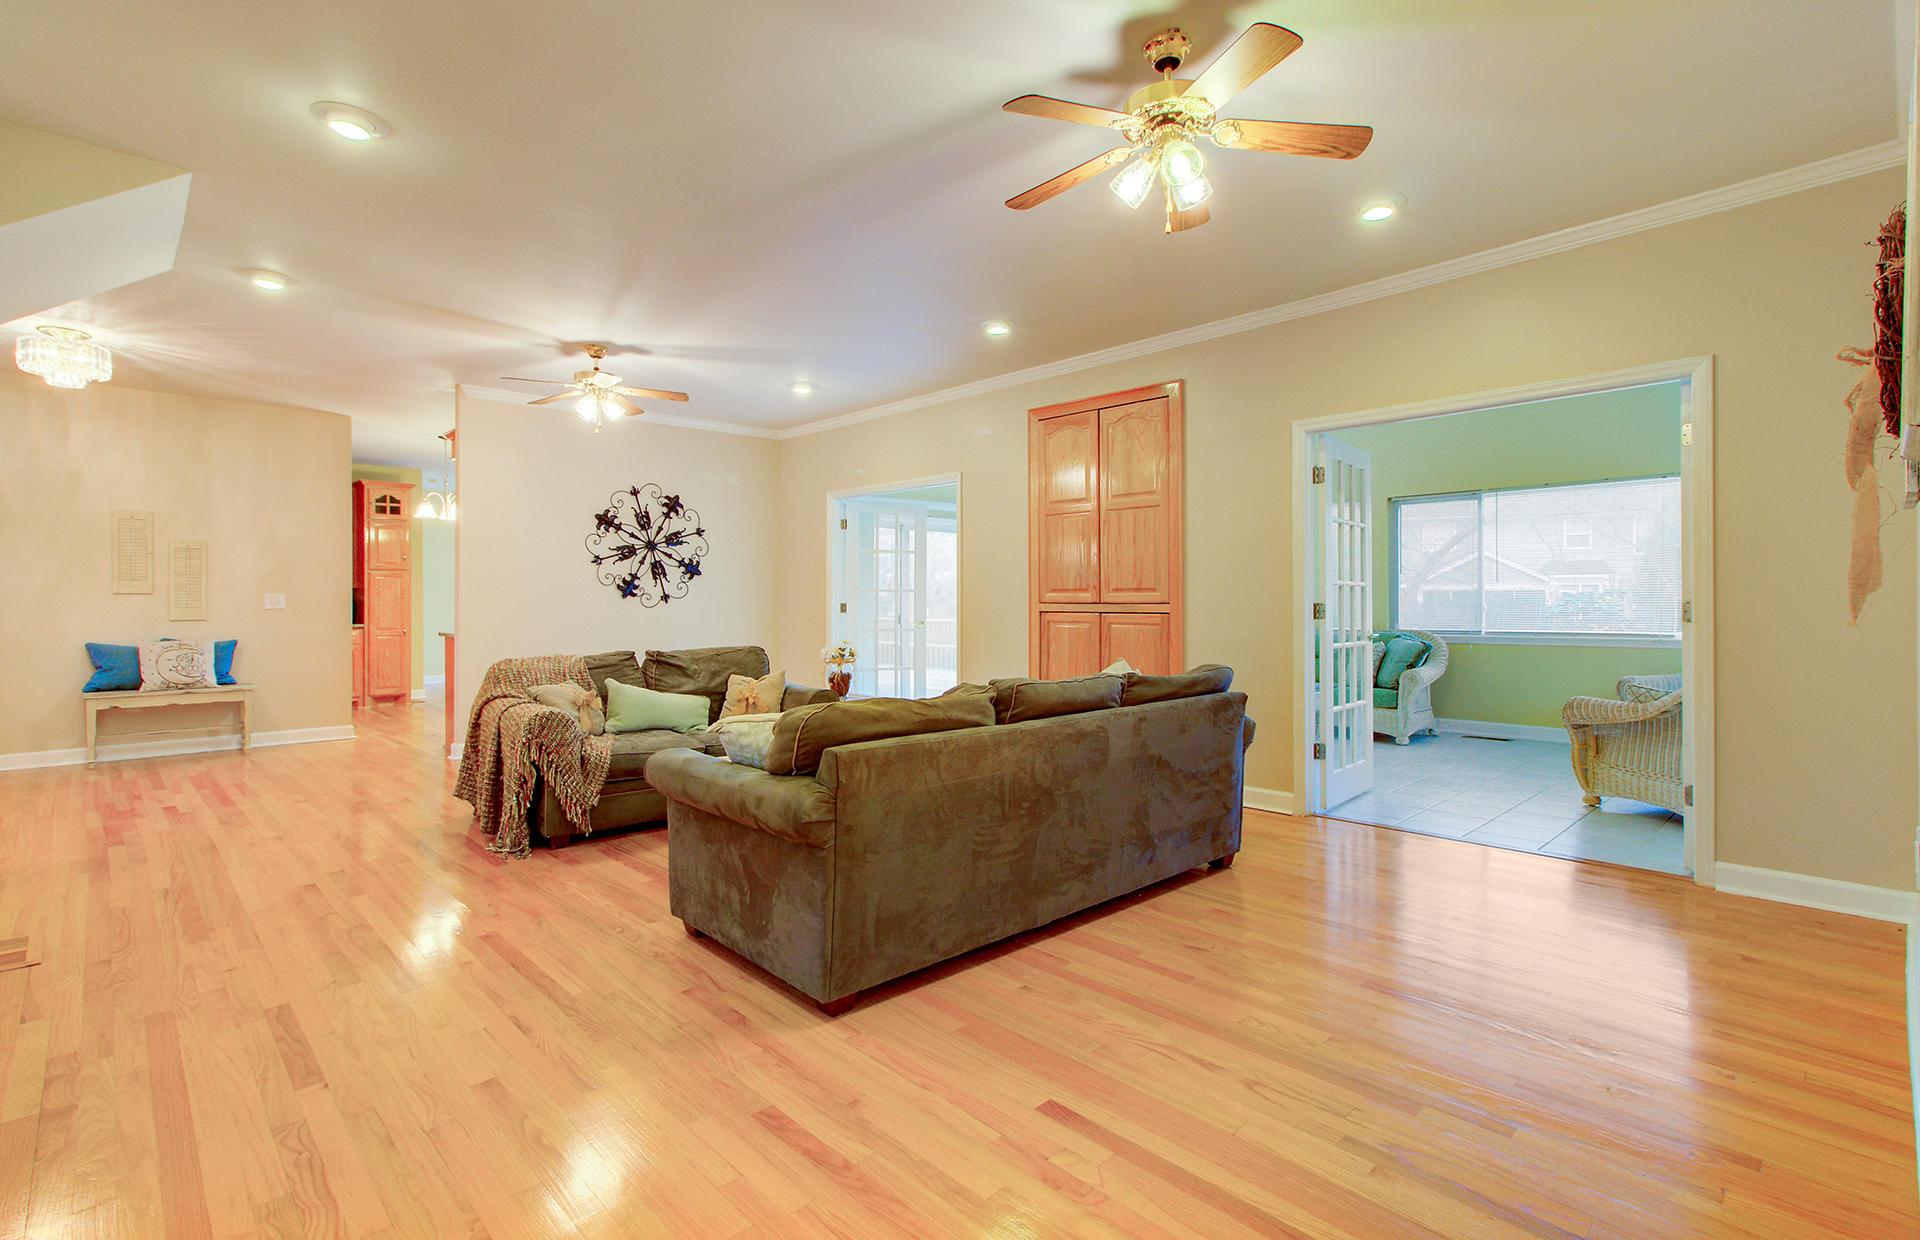 Bakers Landing Homes For Sale - 105 River Oak, North Charleston, SC - 46